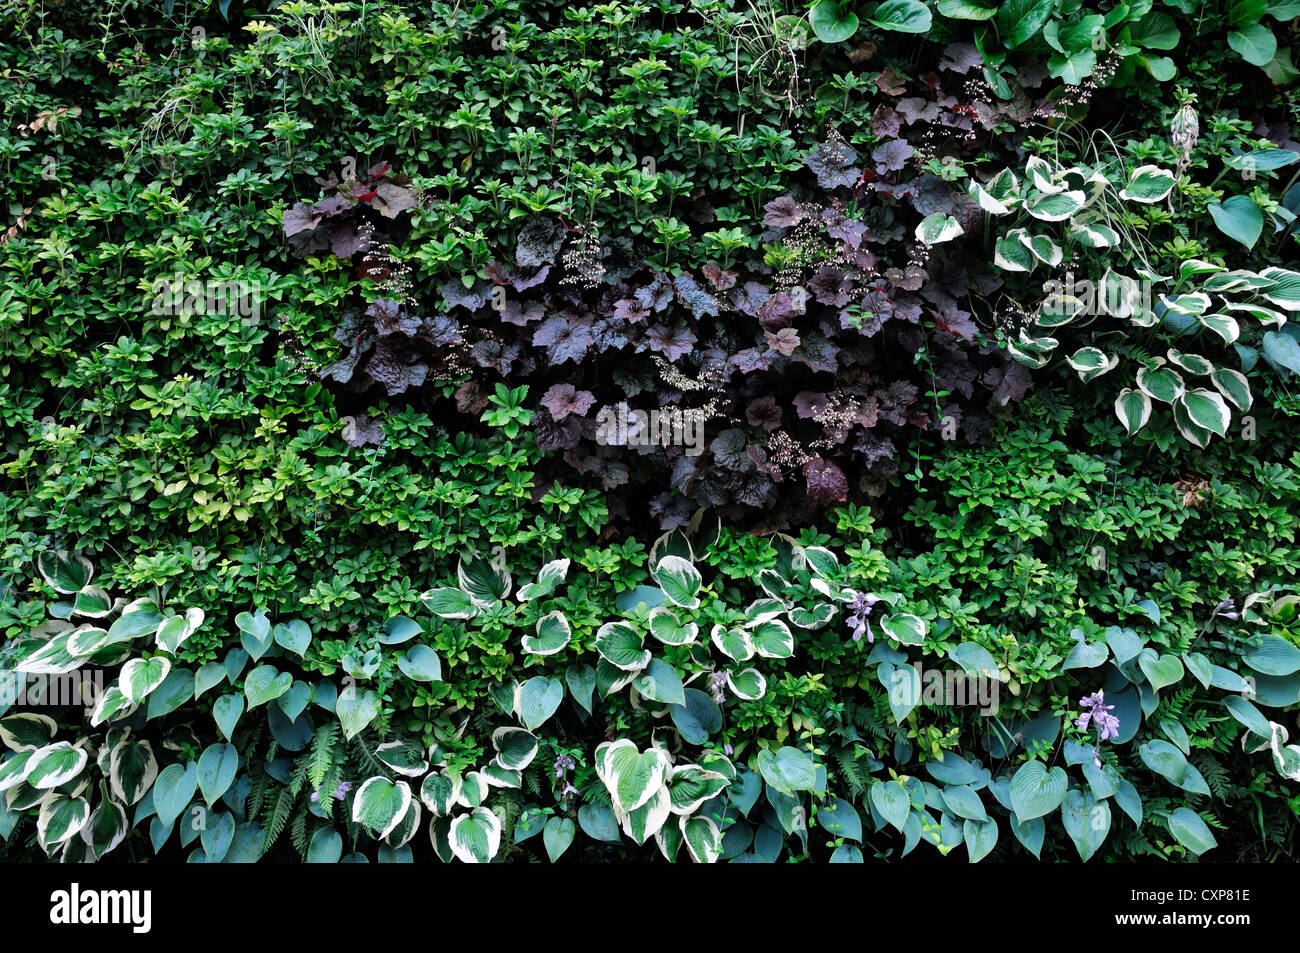 pachysandra terminalis heuchera hosta living green wall. Black Bedroom Furniture Sets. Home Design Ideas